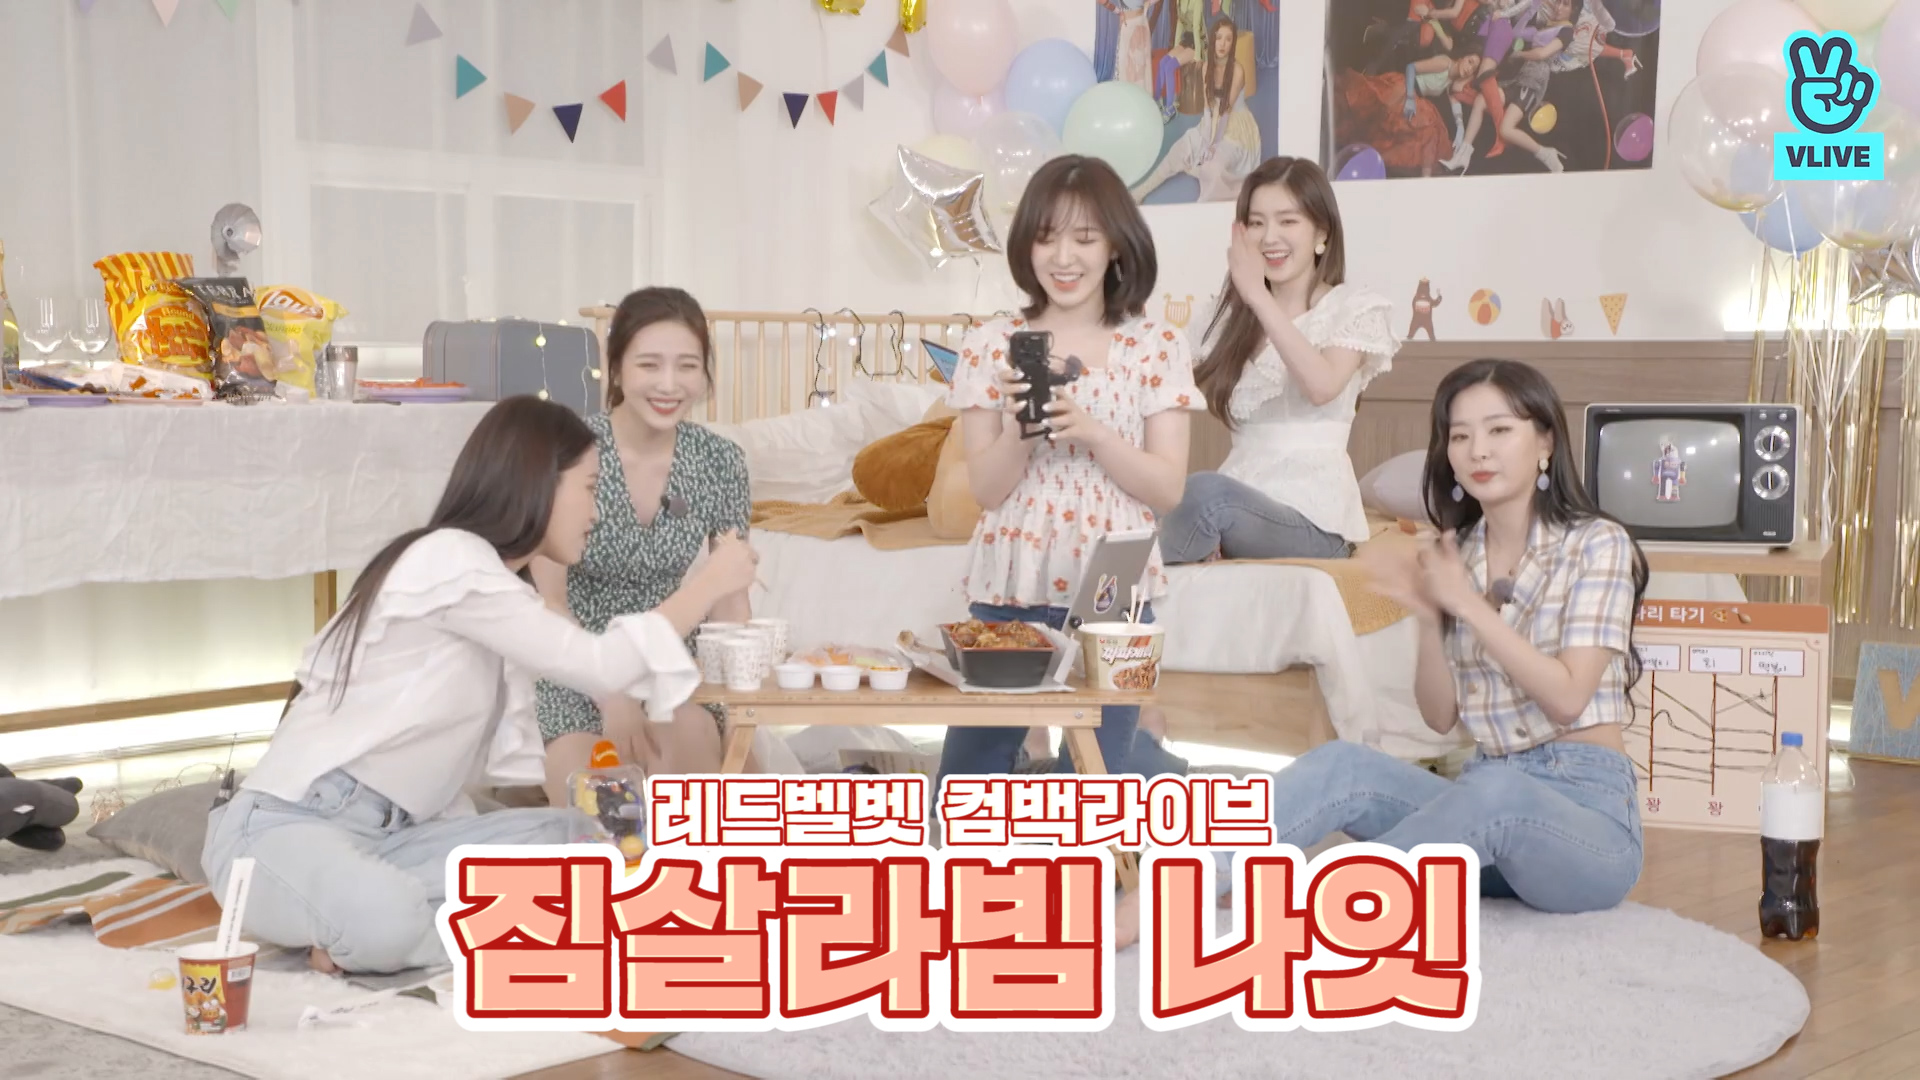 [Red Velvet] 짐살라빔짐짐살라빔짐짐살라깜찍레벨빔에 맞은 당신은 짐며들고있는중...🧚♀ (Red Velvet talking about their new album)